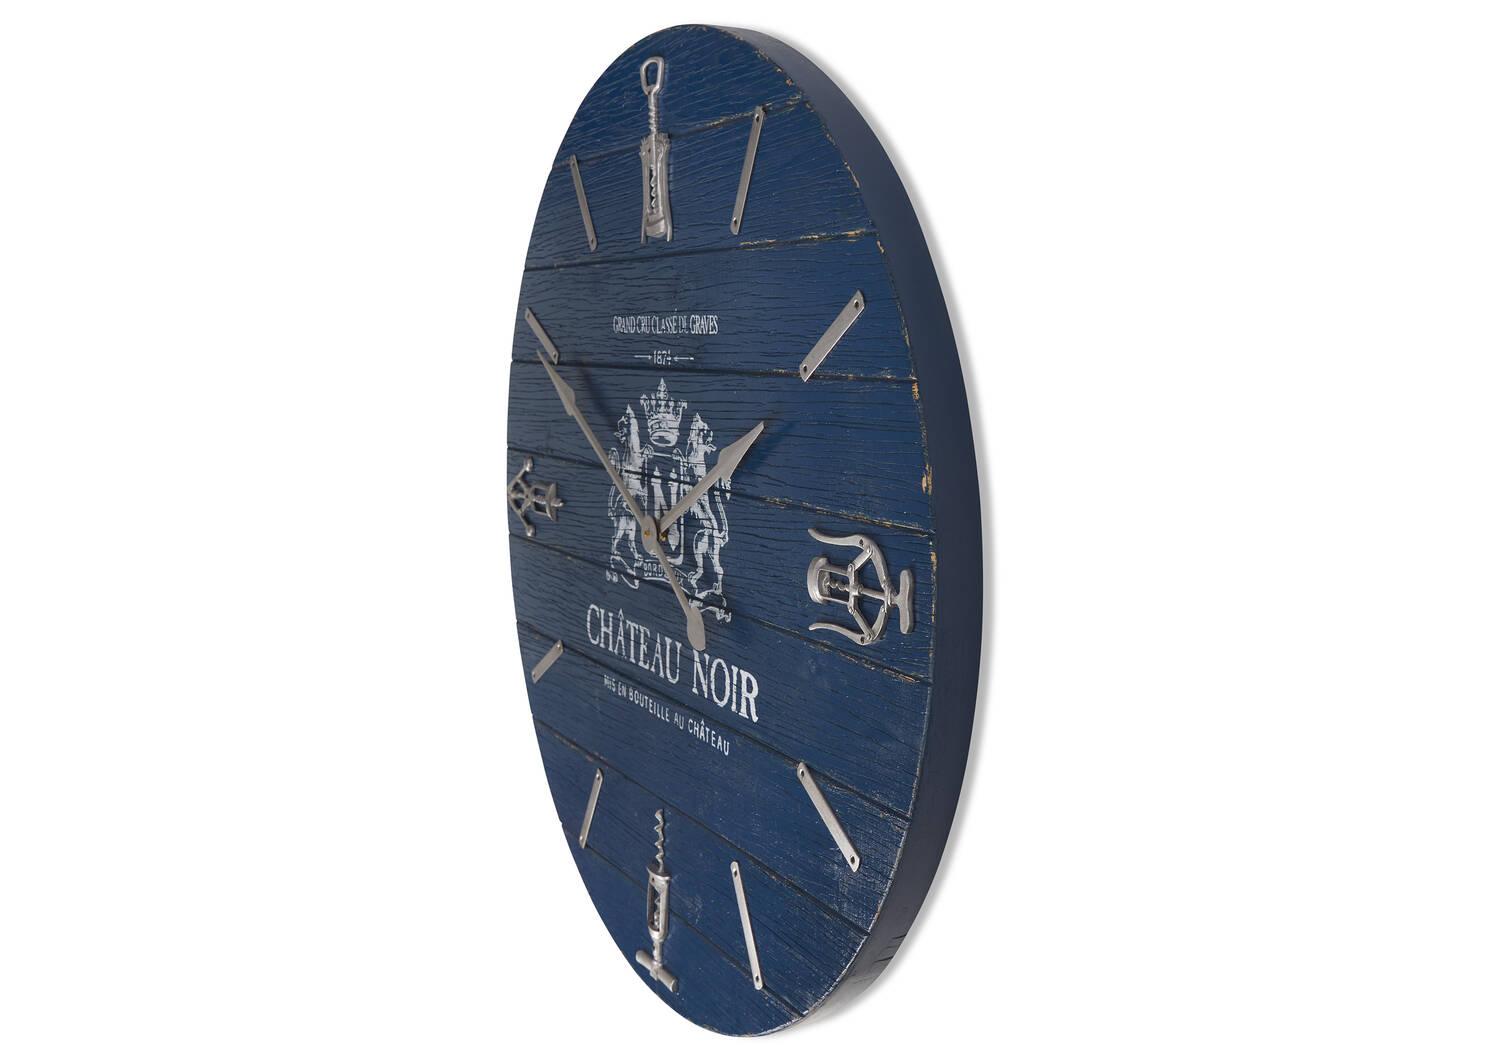 Napa Wall Clock